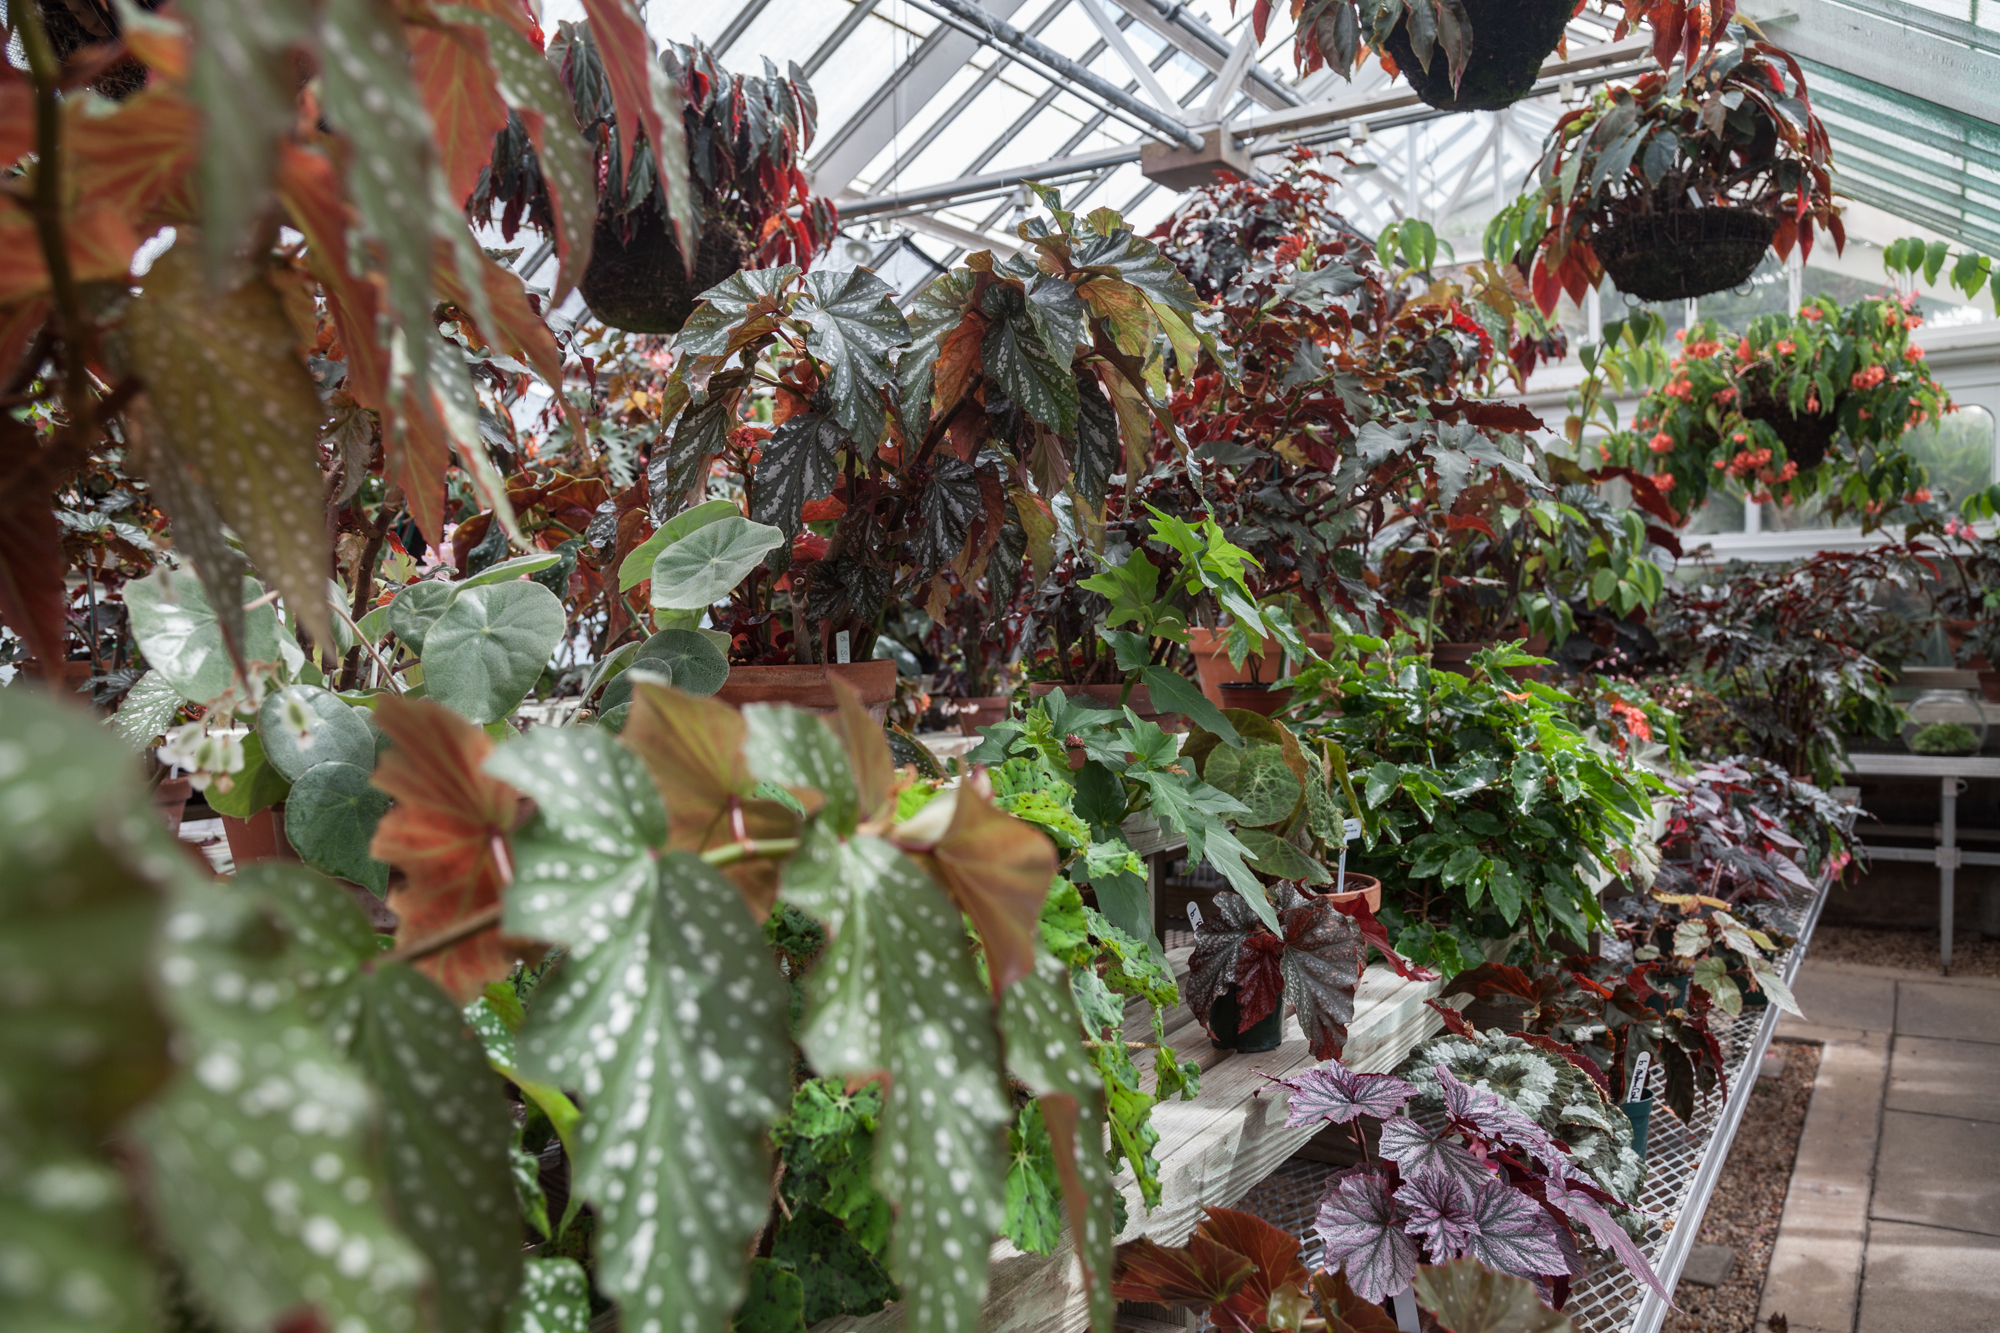 Planting-Fields-Arboretum-Greenhouse-Homestead-Brooklyn-Bromeliads.jpg